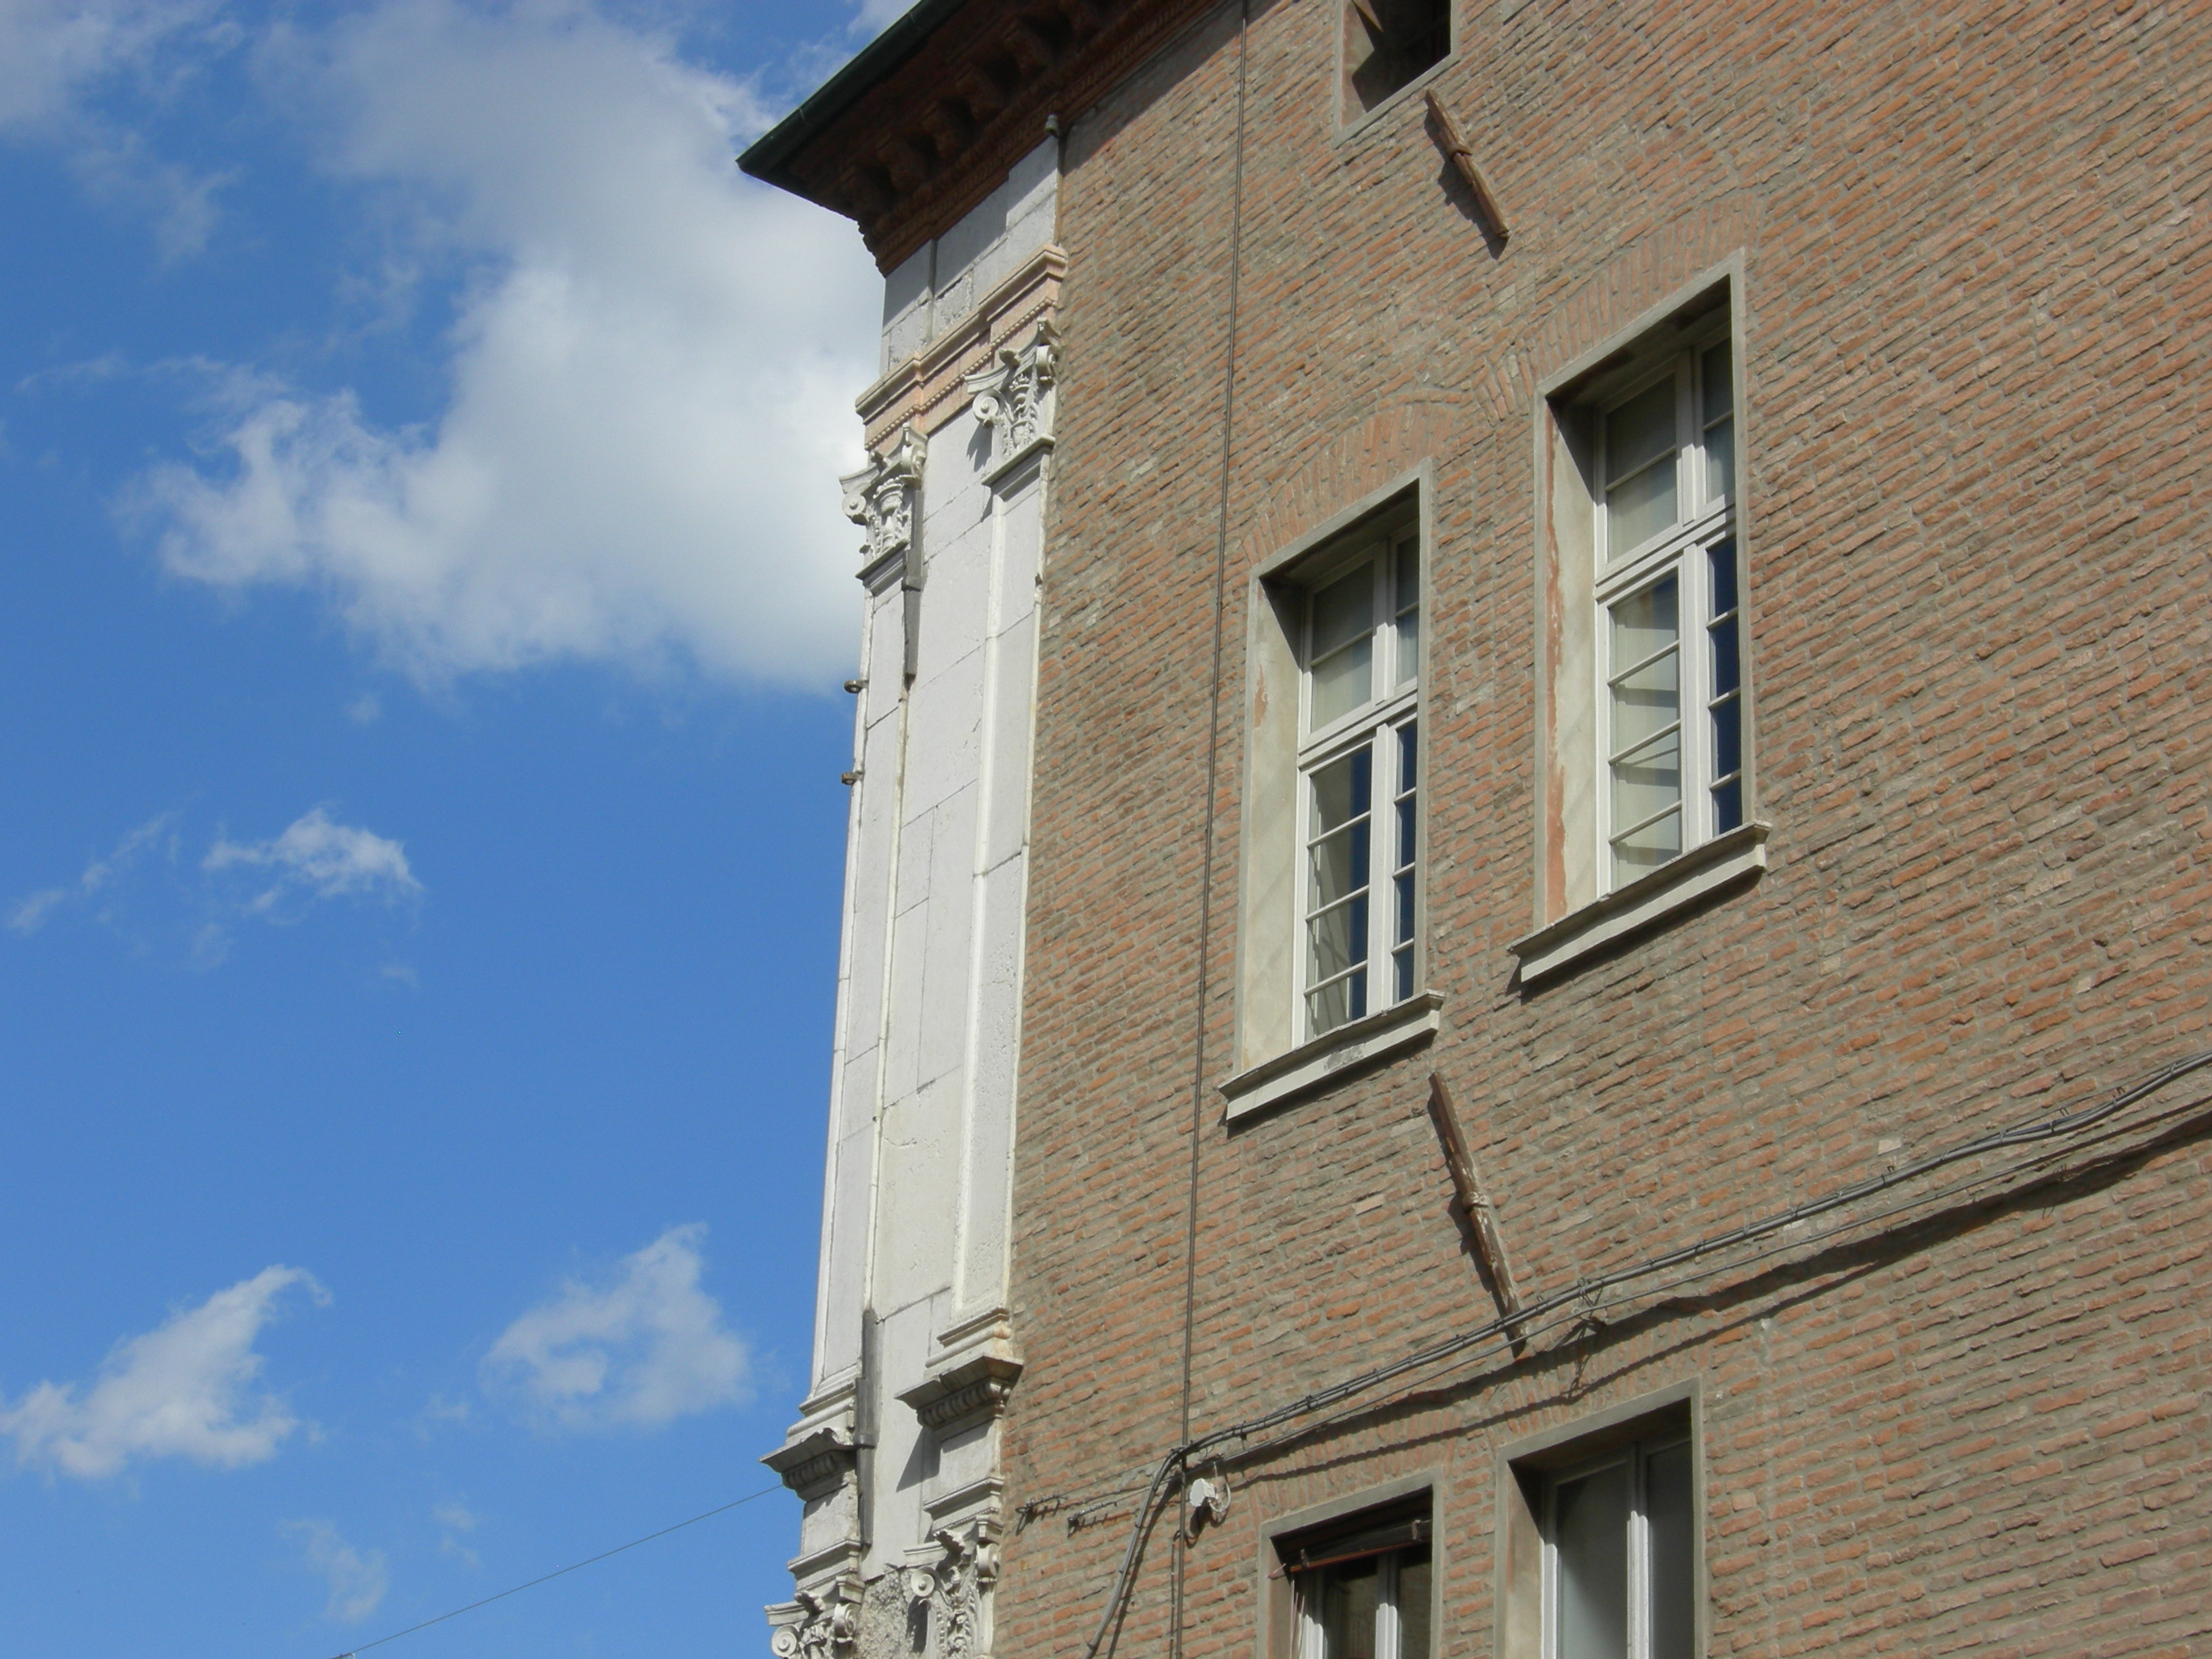 File:Parasta Palazzo Turchi Di Bagno.JPG - Wikimedia Commons